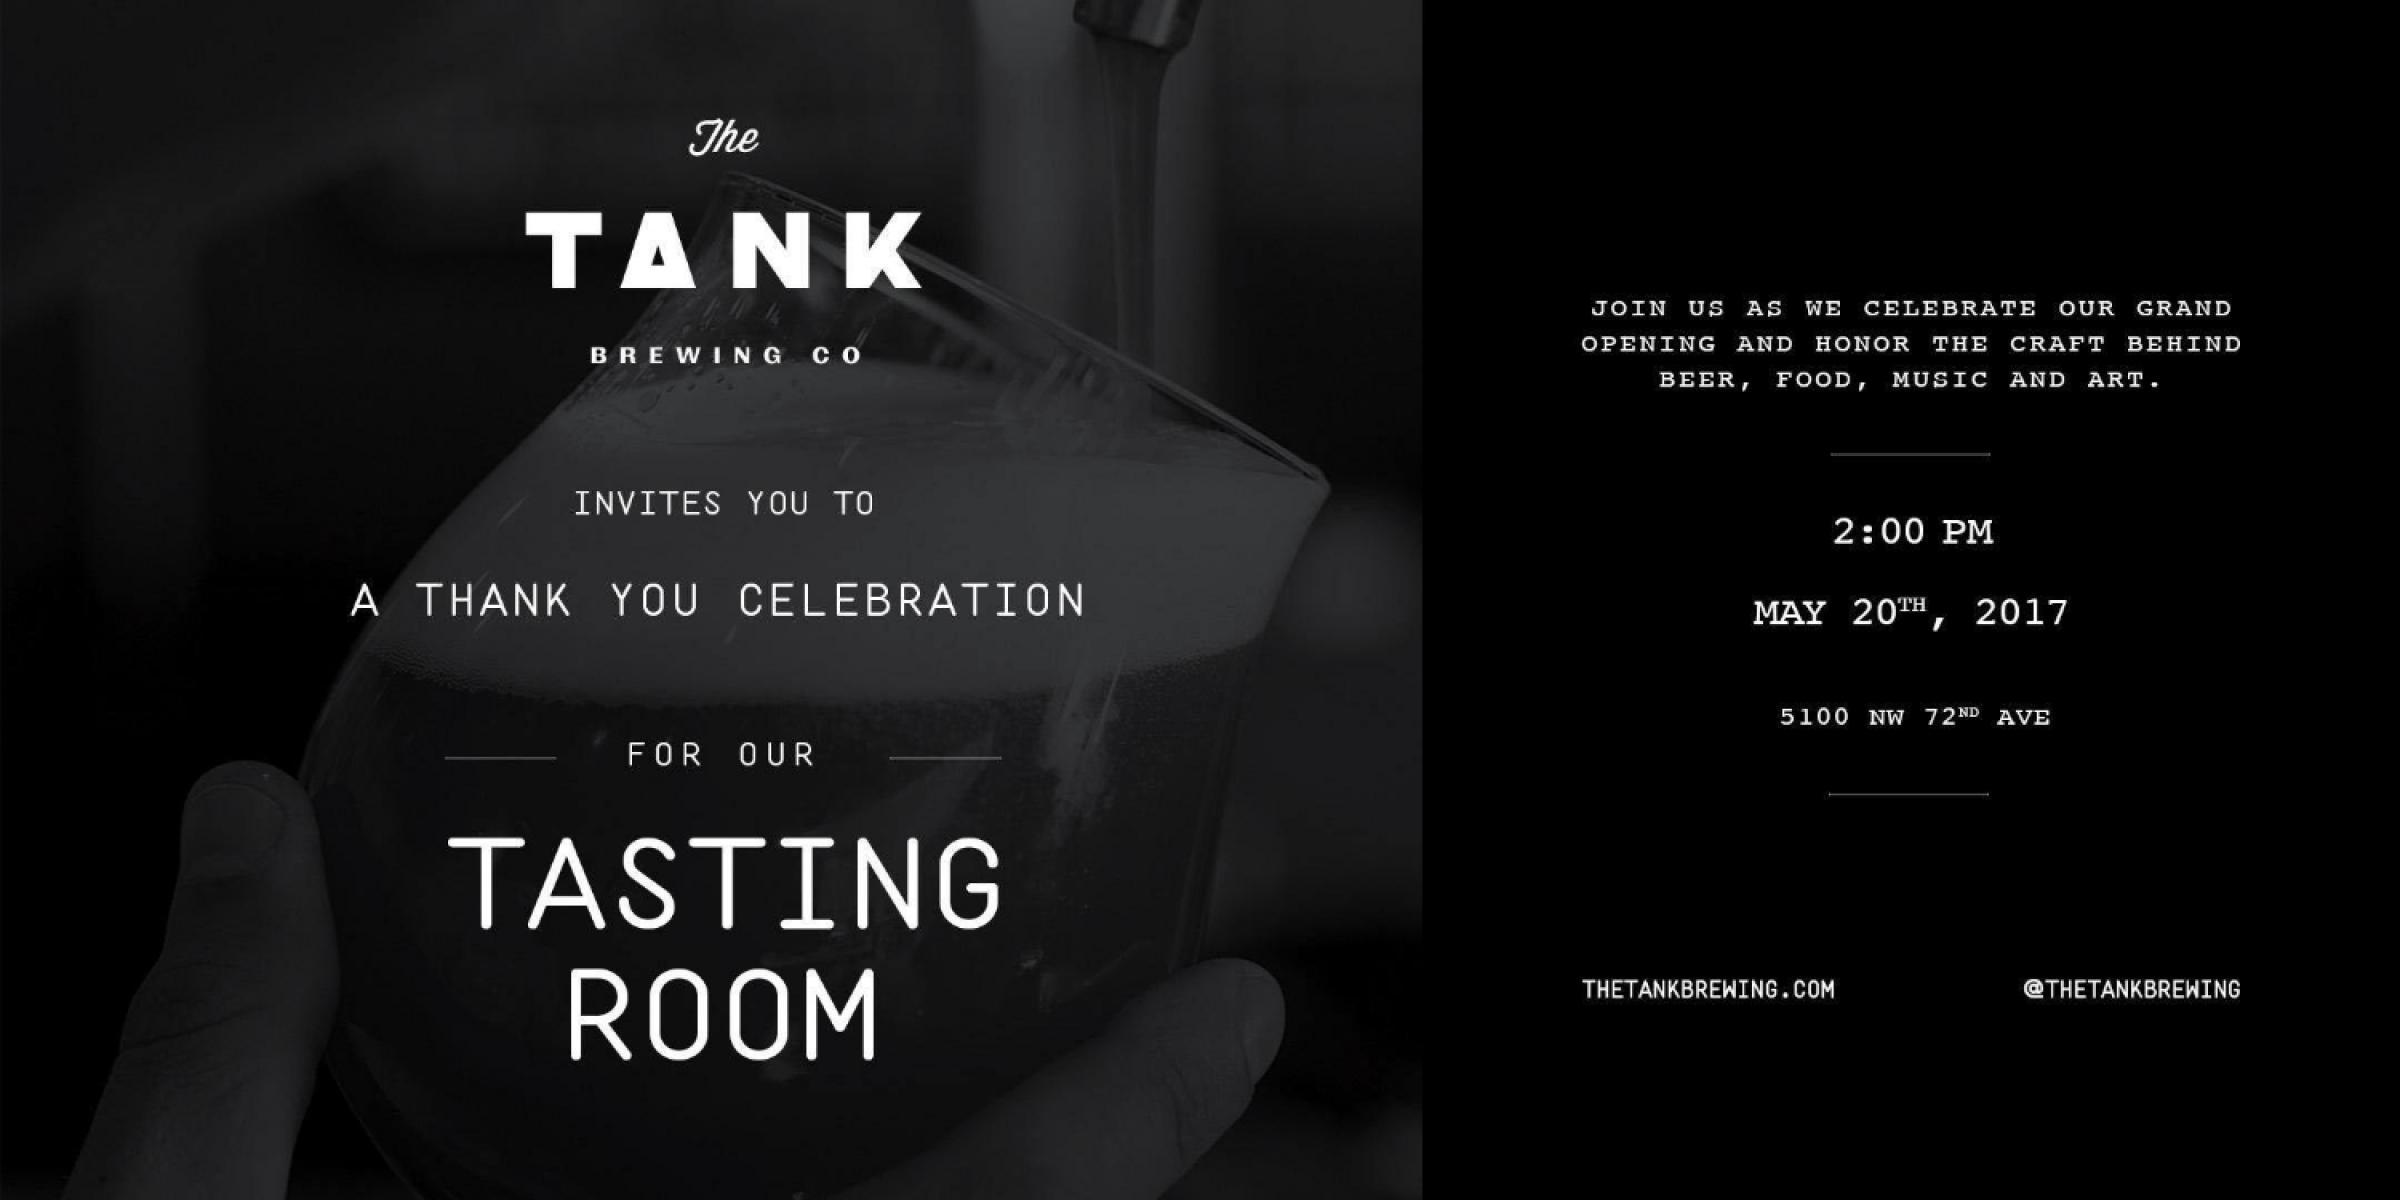 The Tank's Thank You Celebration